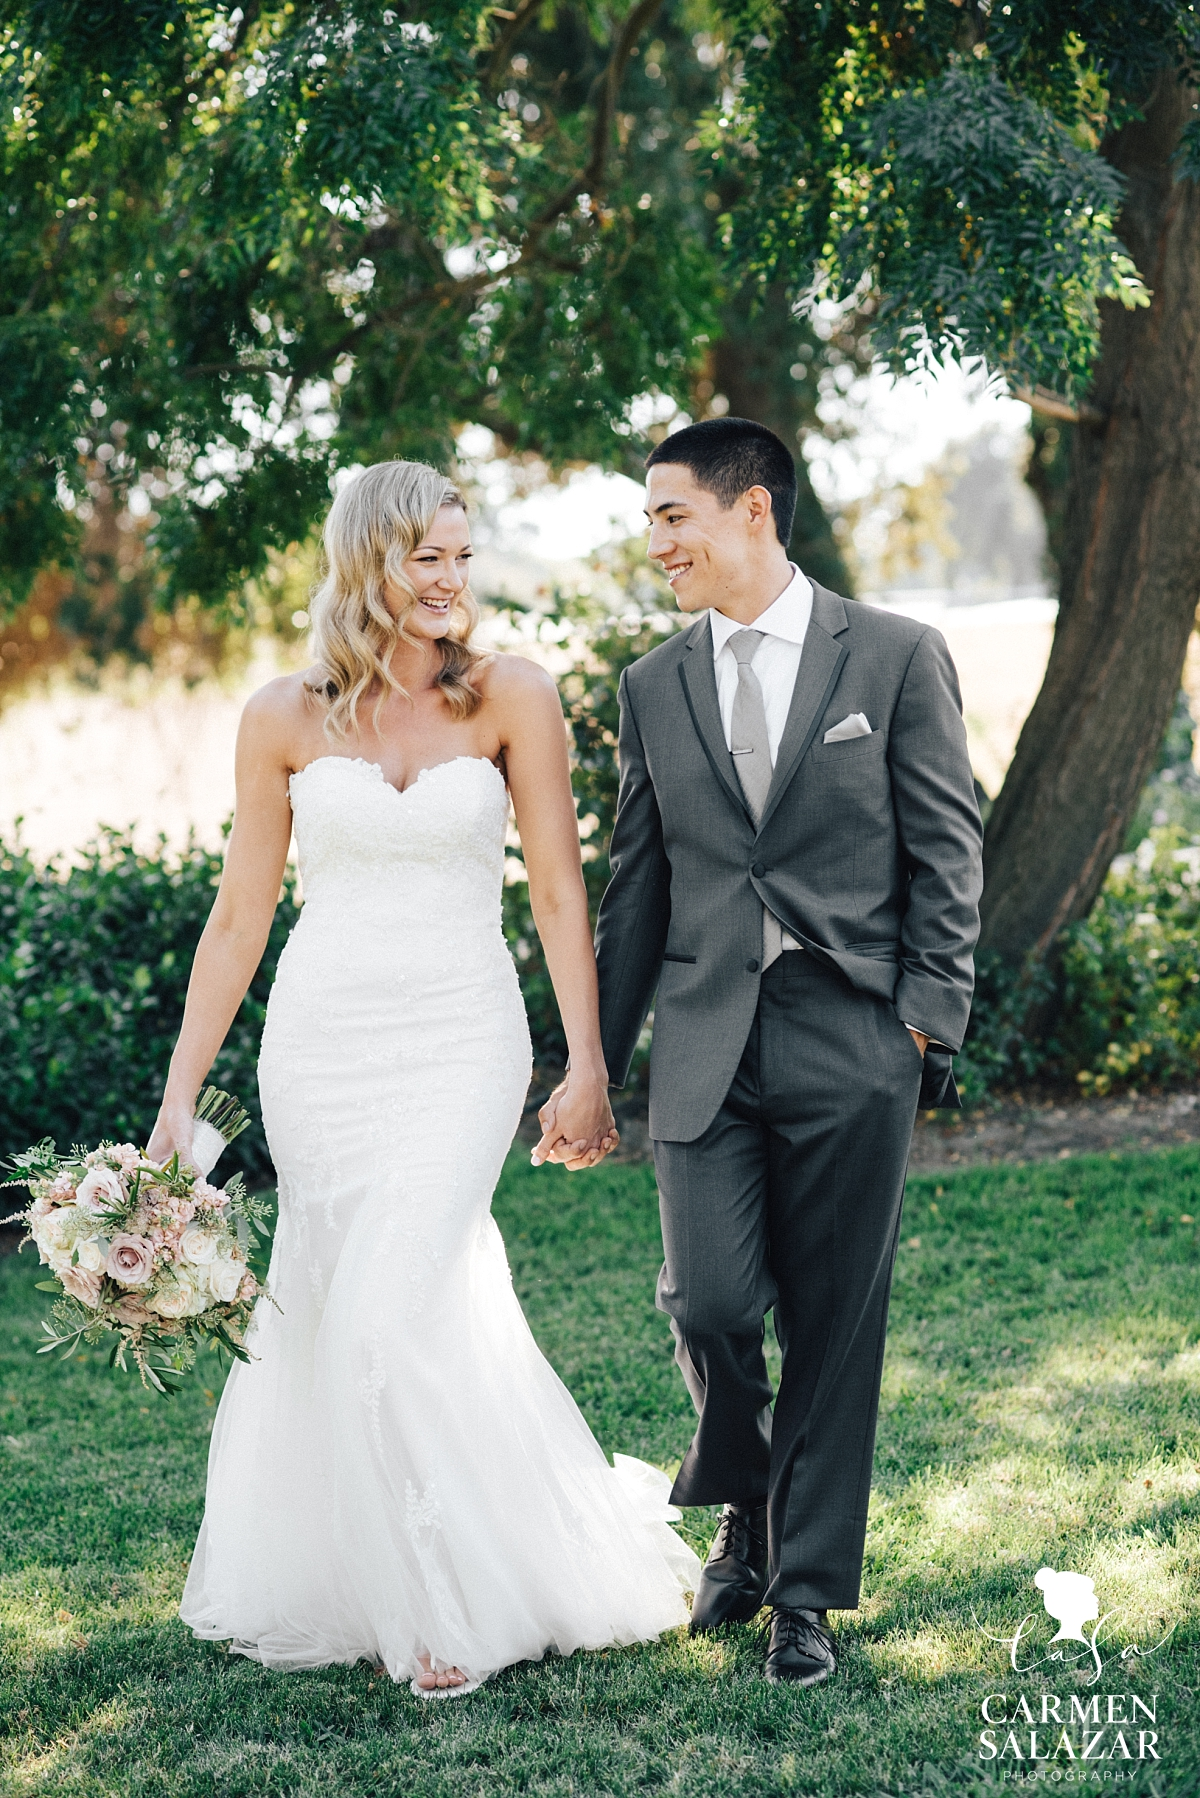 Sweet bride and groom at summer Scribner Bend winery wedding - Carmen Salazar